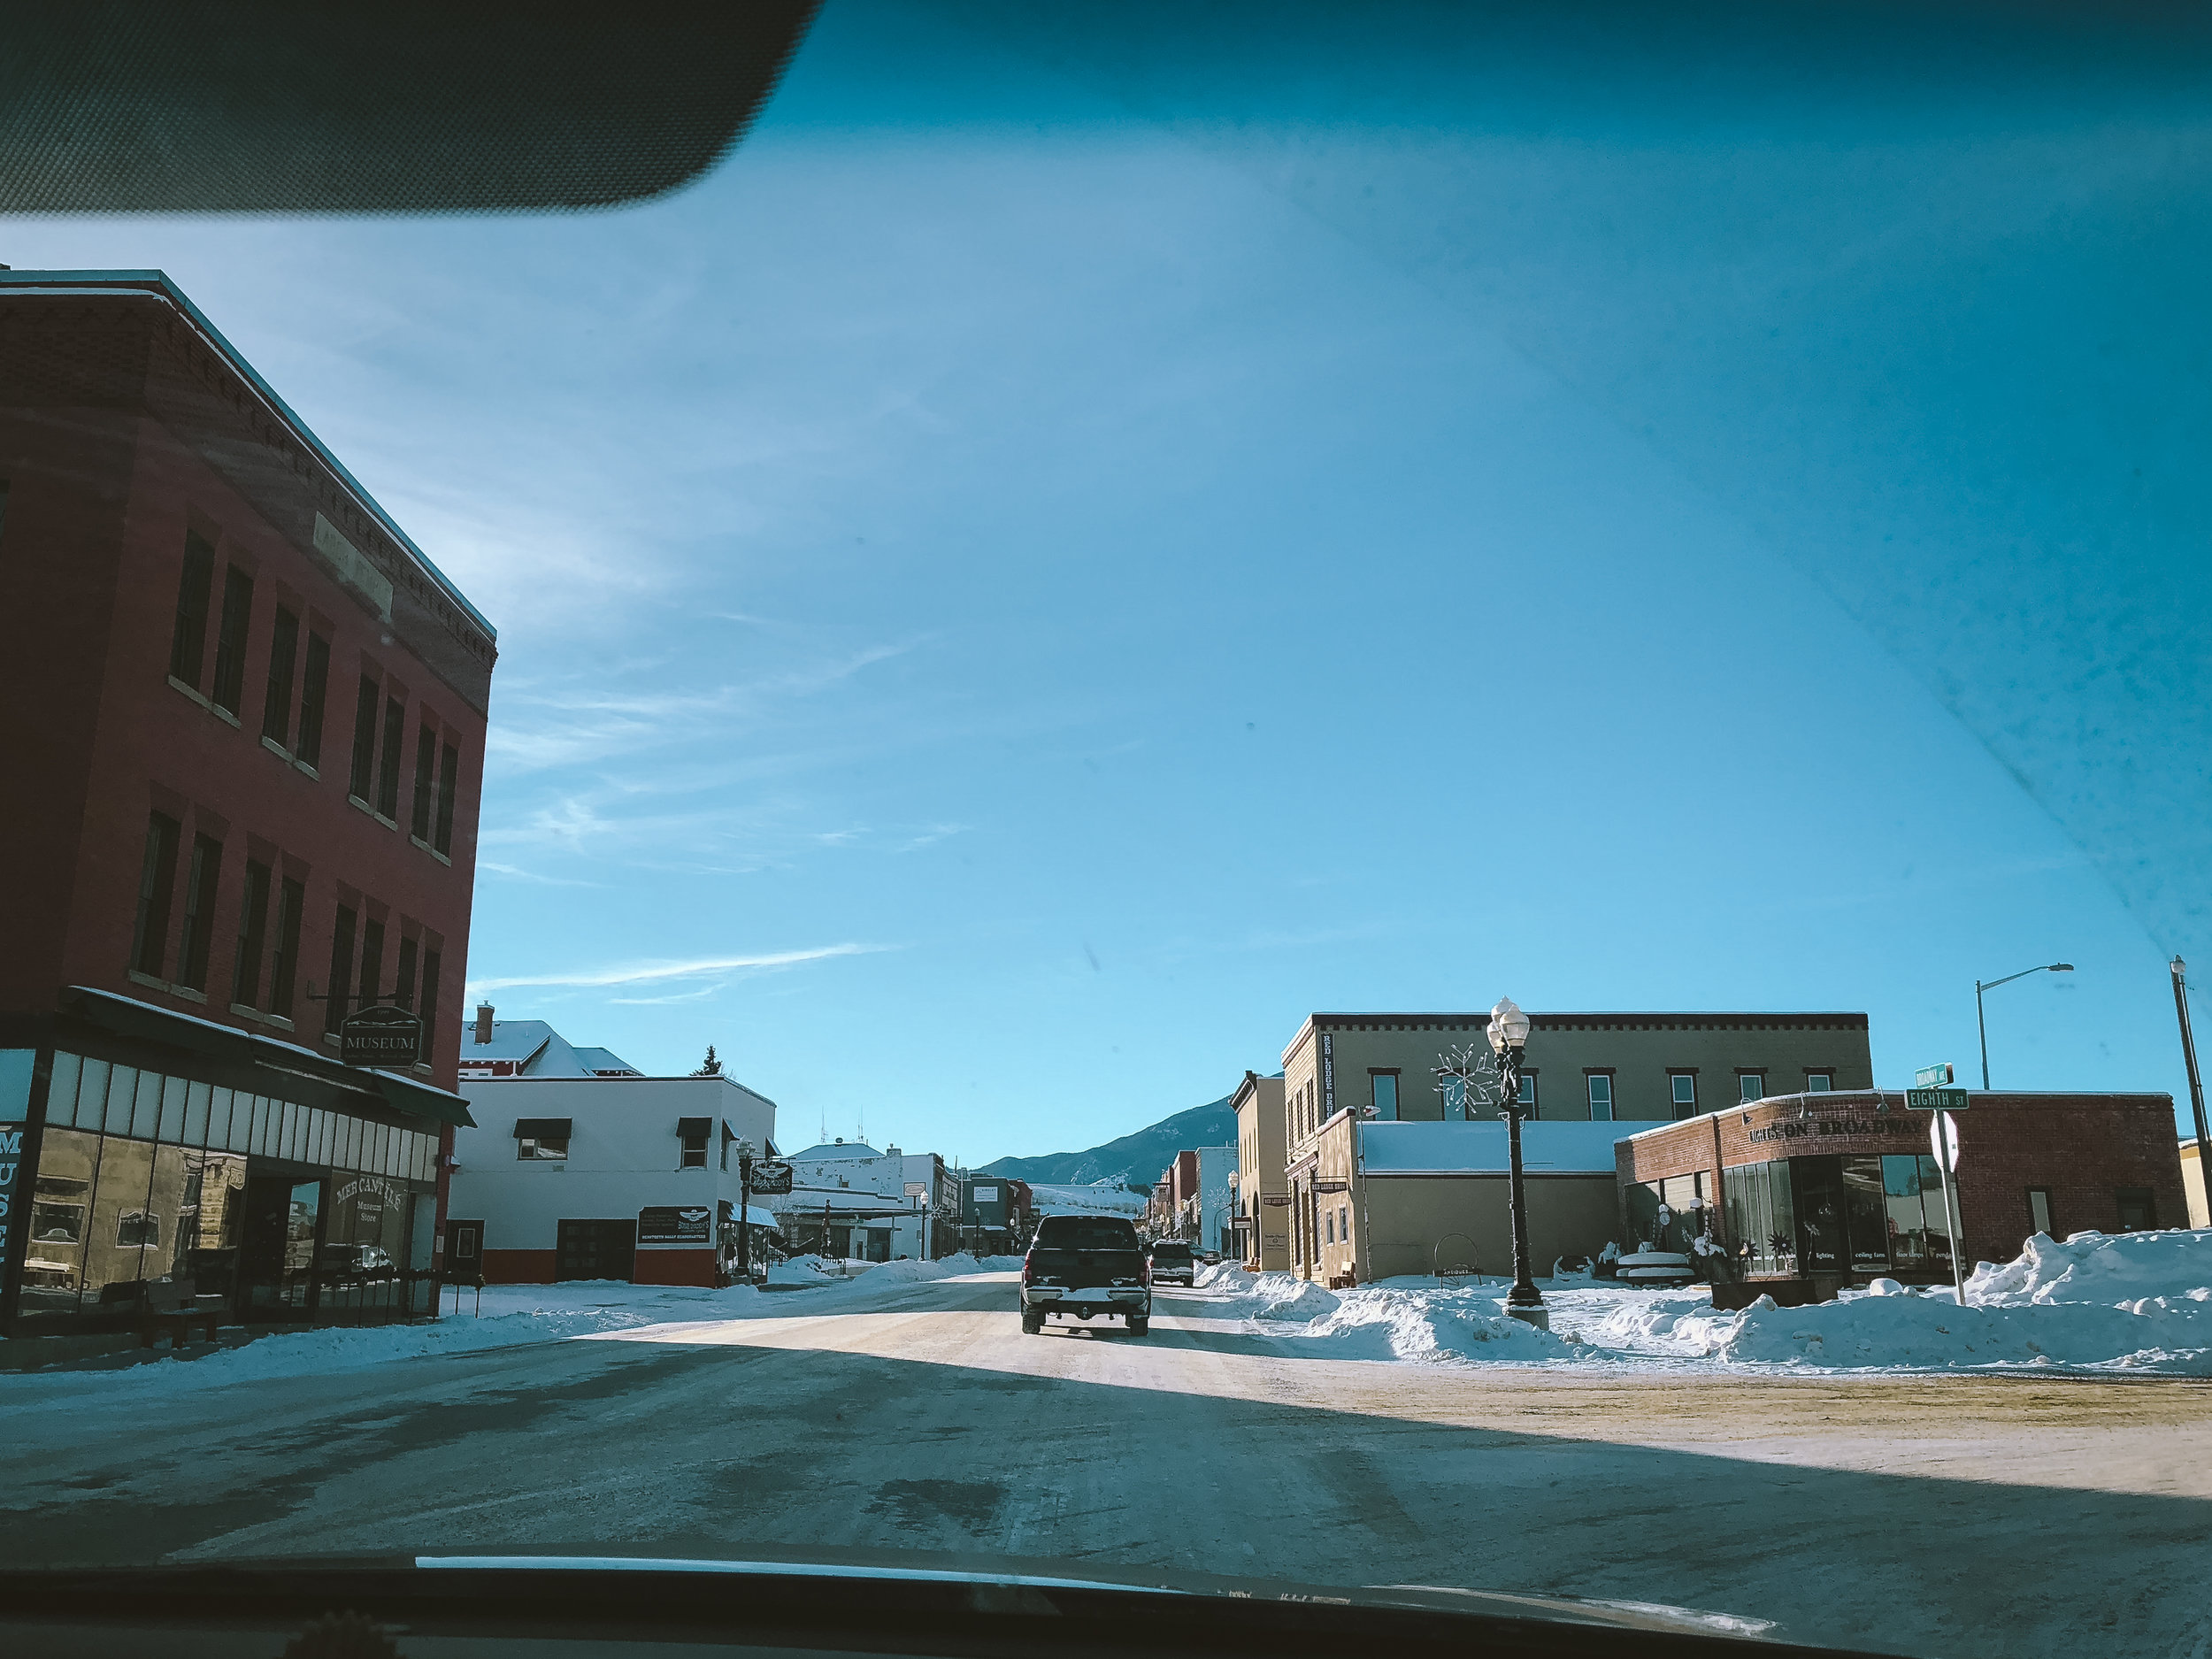 Montana2018_iPhone_29.JPG